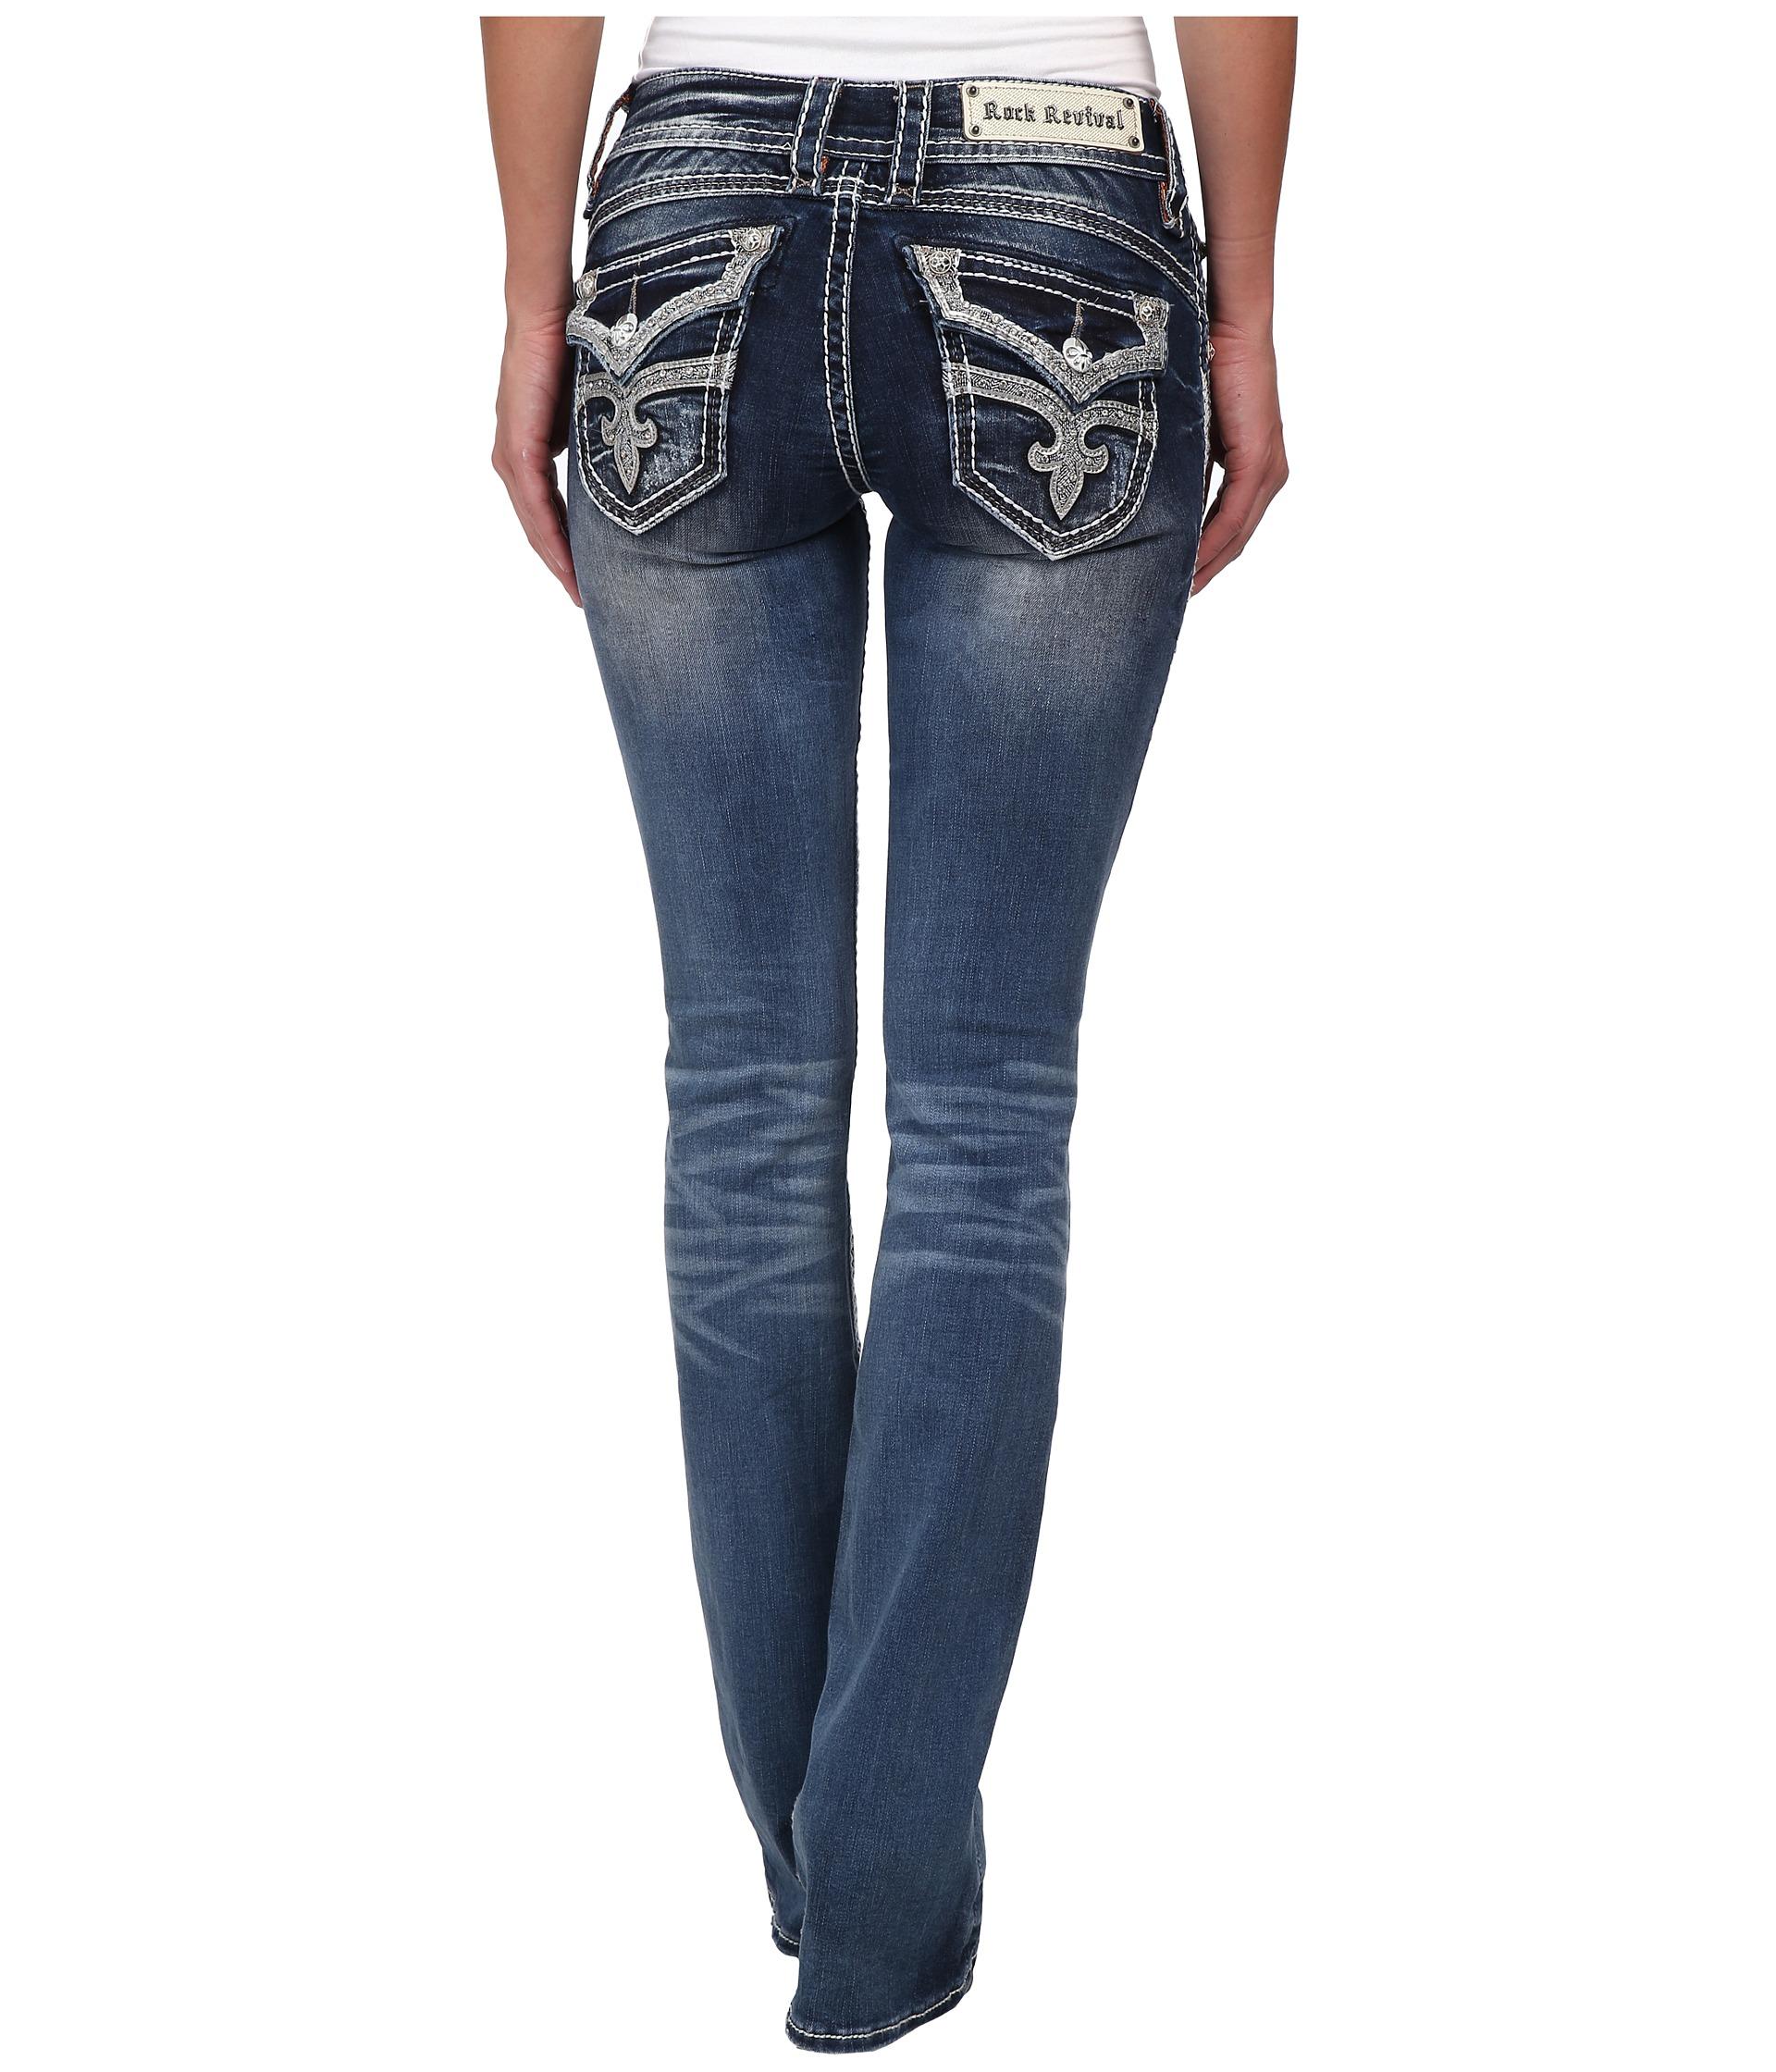 Rock Revival Stephanie B40 Sequin Embellished Skinny Jean